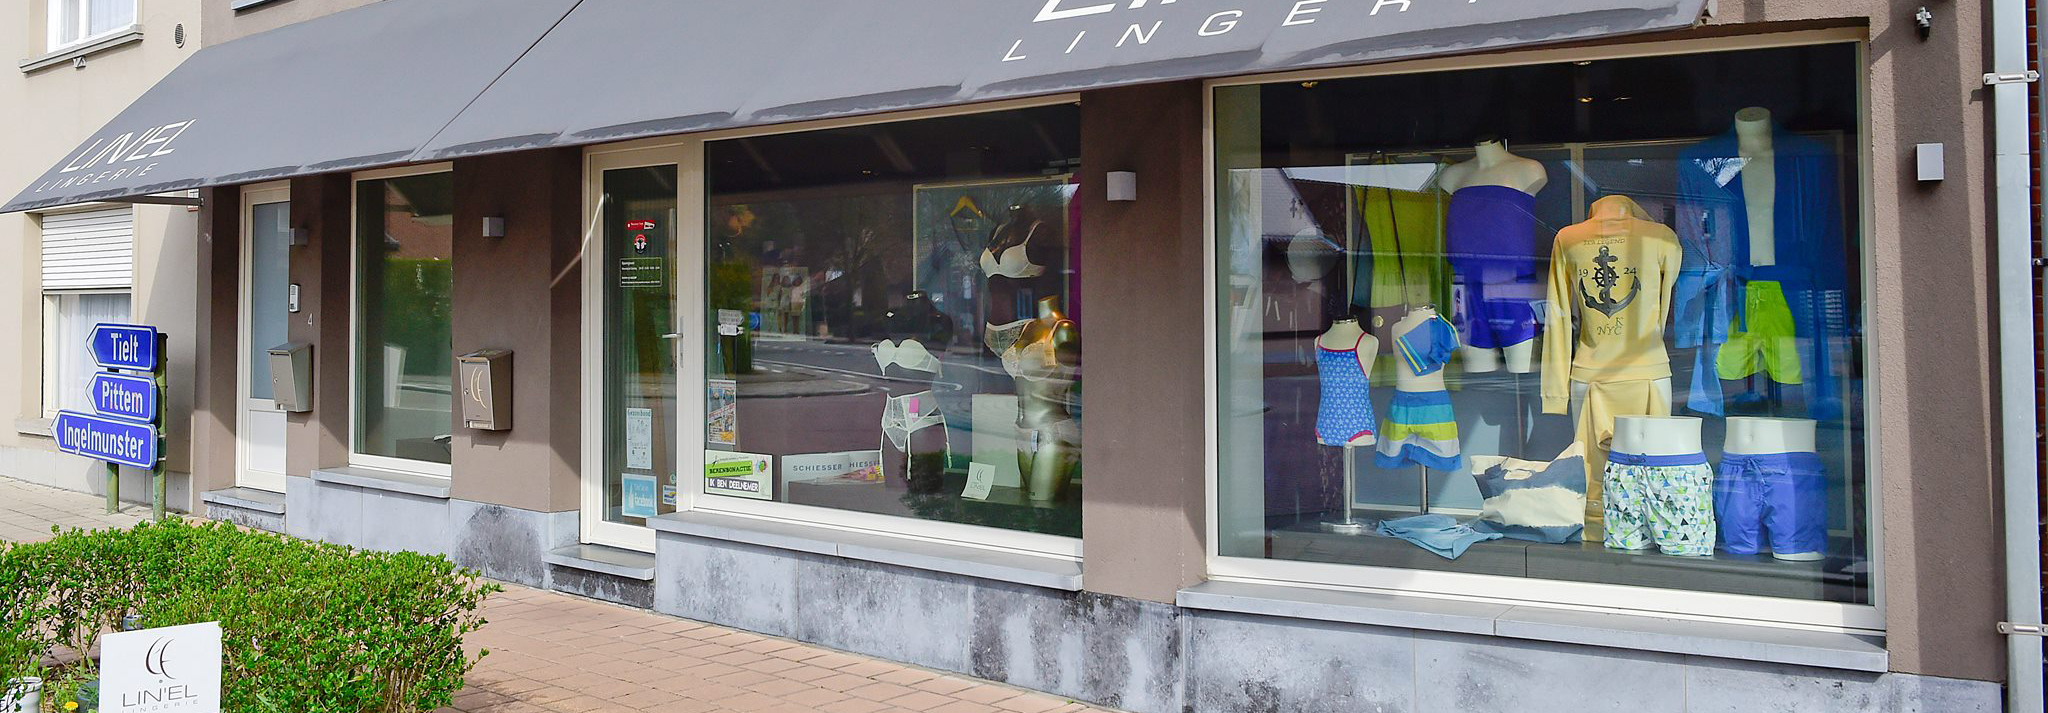 Lingerie winkel